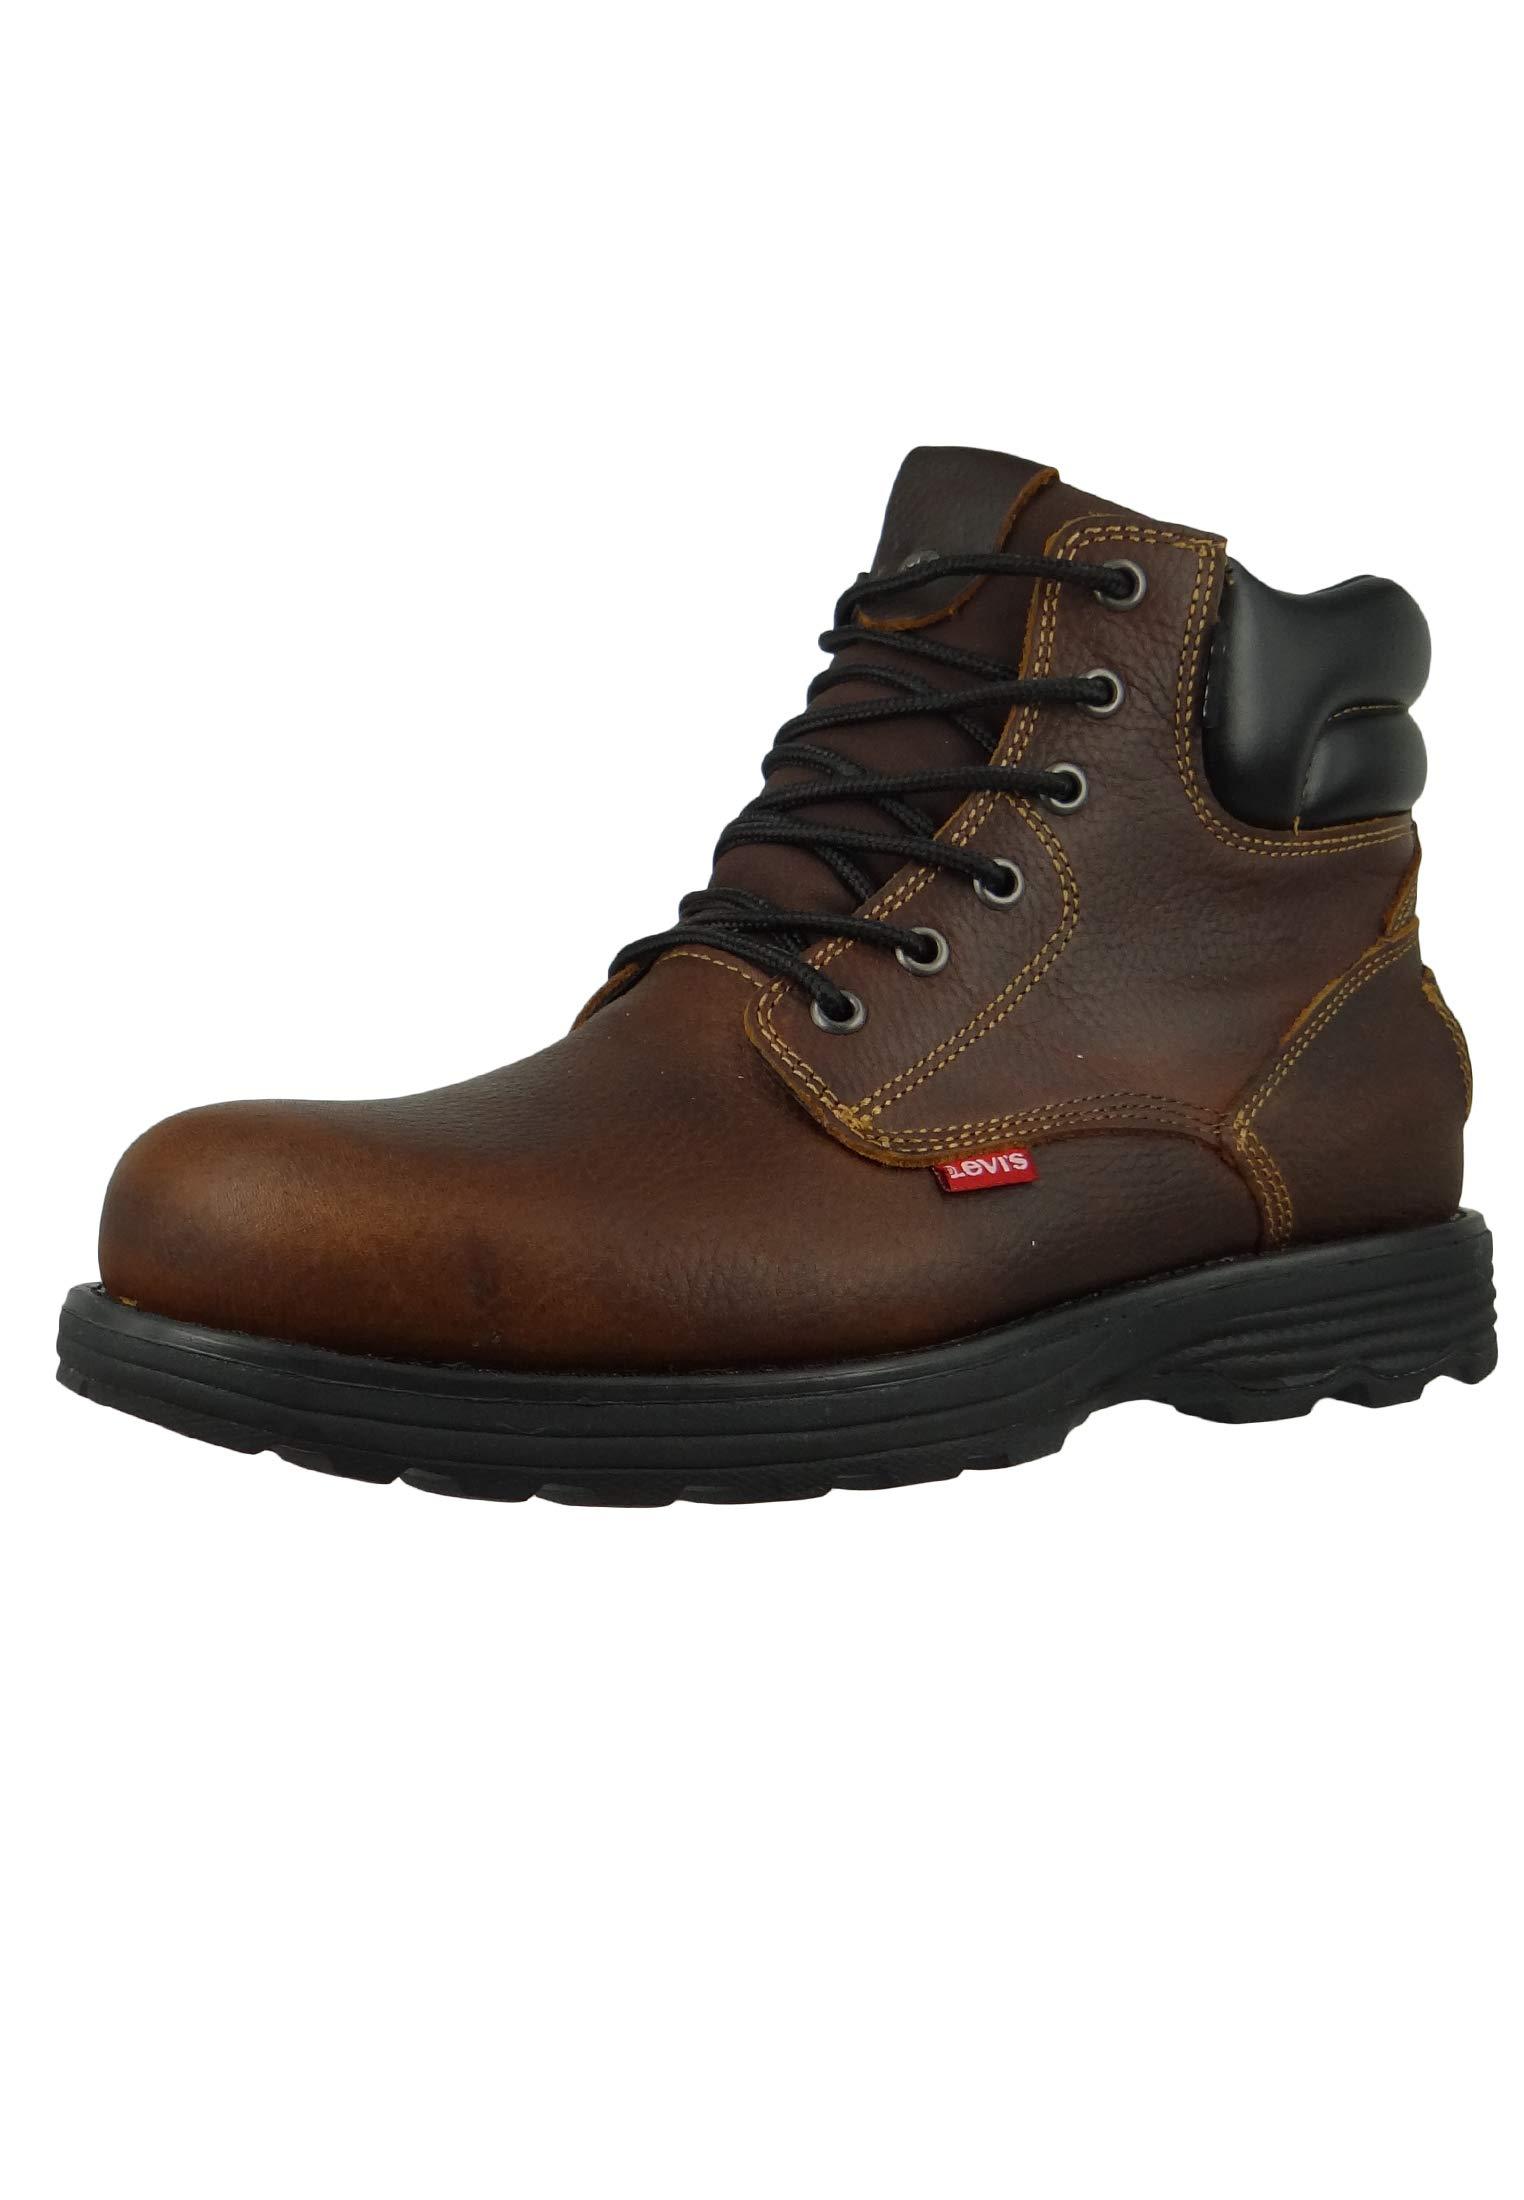 Levi's Arrowhead 228777-829-128 Men's Walking Boots Brown 1